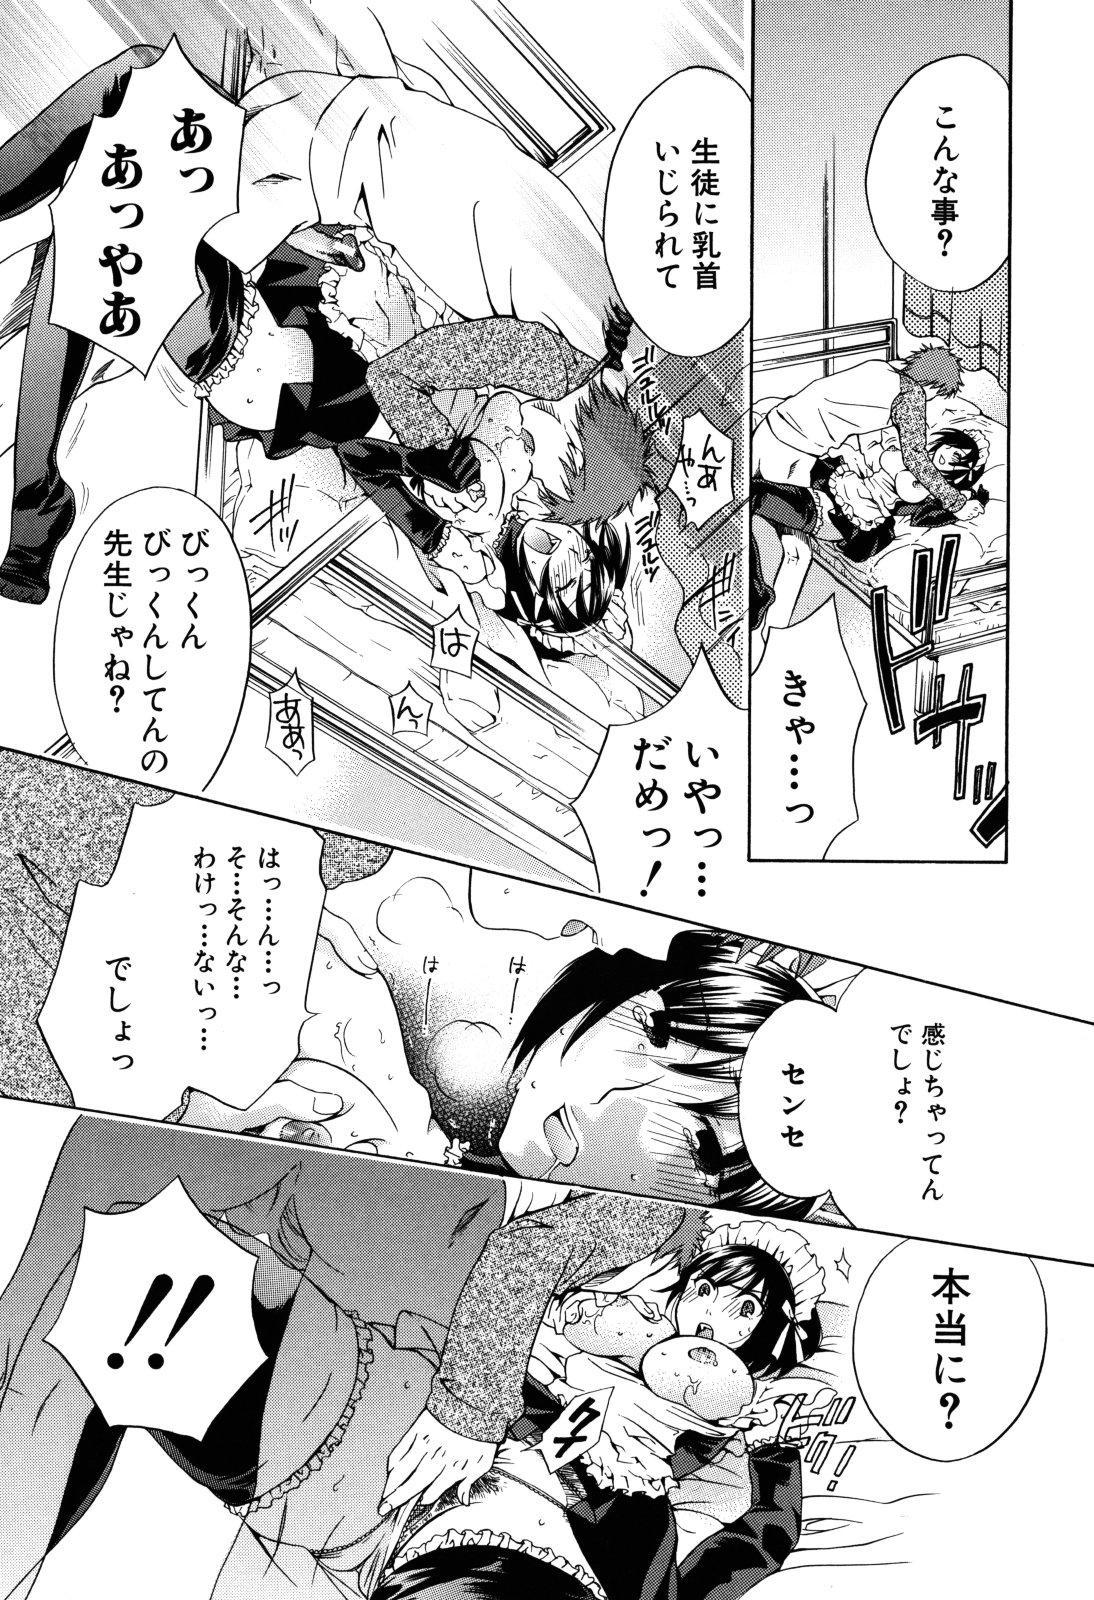 Kanojo ga Ochiru made - She in the depth 107